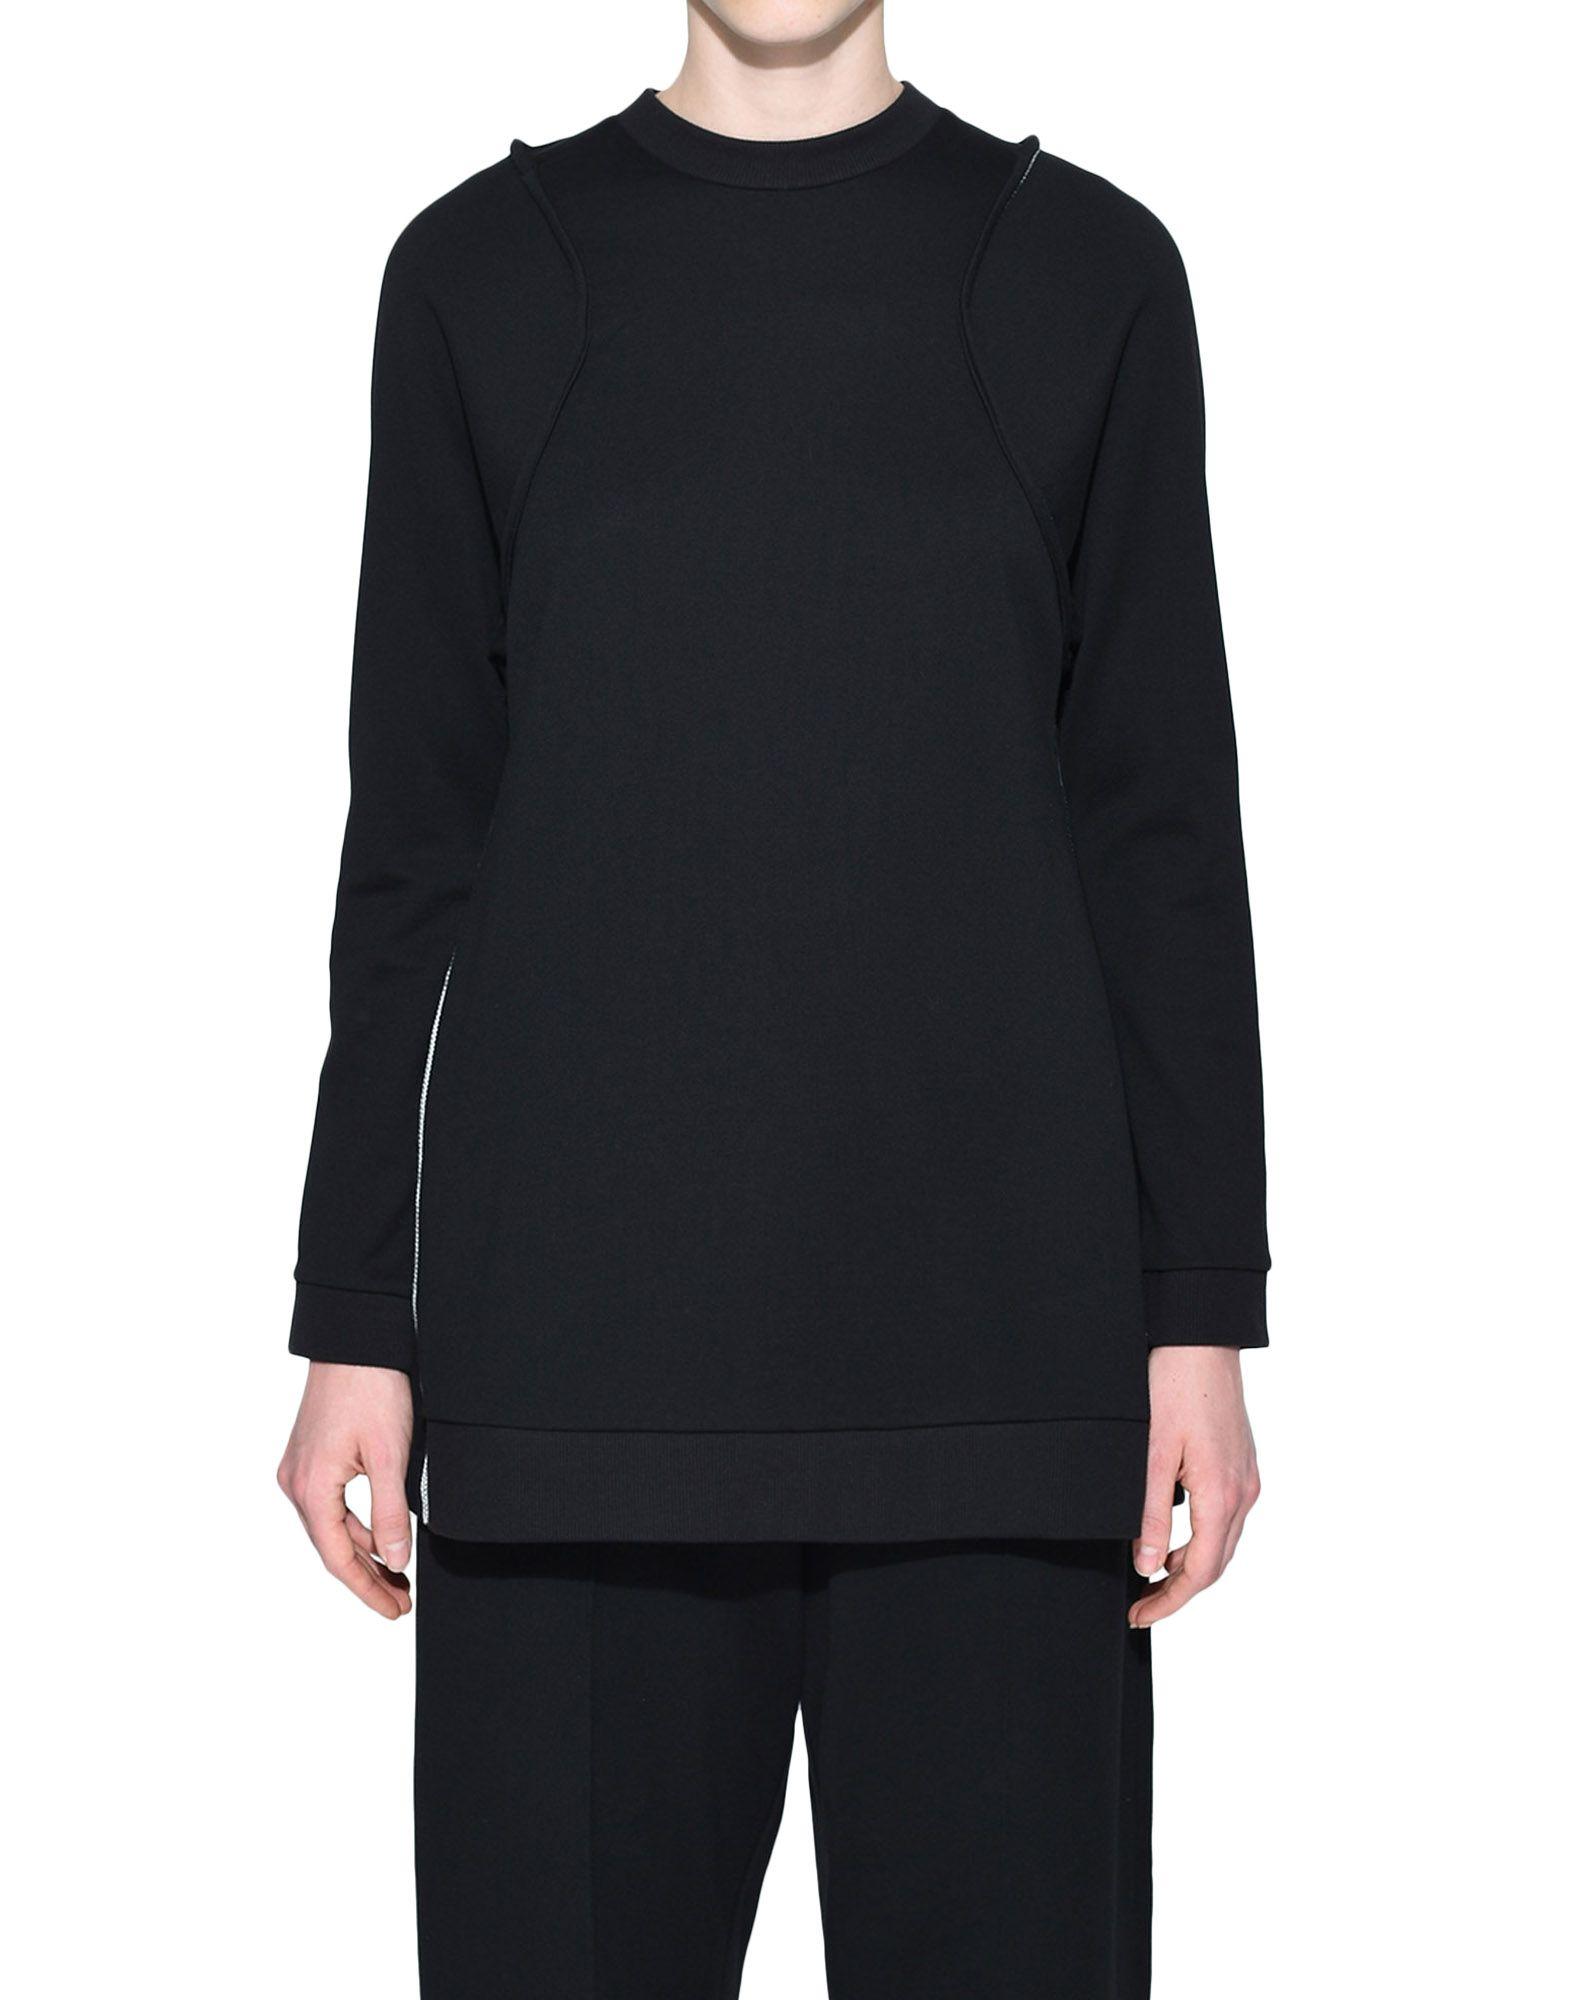 Y-3 Y-3 Sashiko Sweater Sweatshirt Woman r